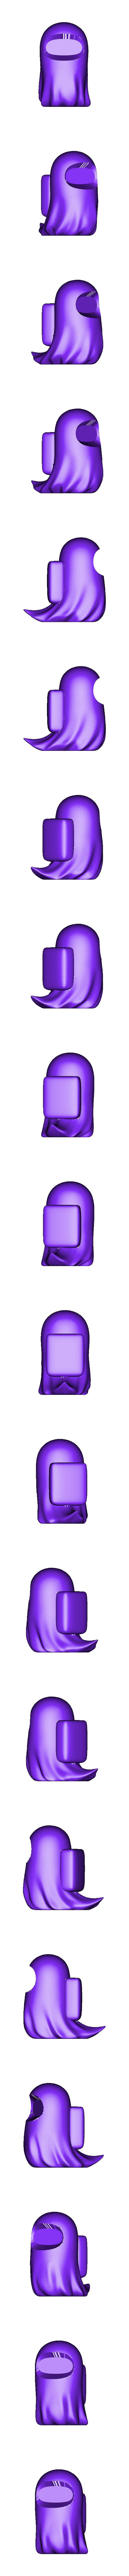 ghost.obj Download free OBJ file Among Us (easy print)(crew/body/ghost/impostor) • 3D printable template, devanborkhatria